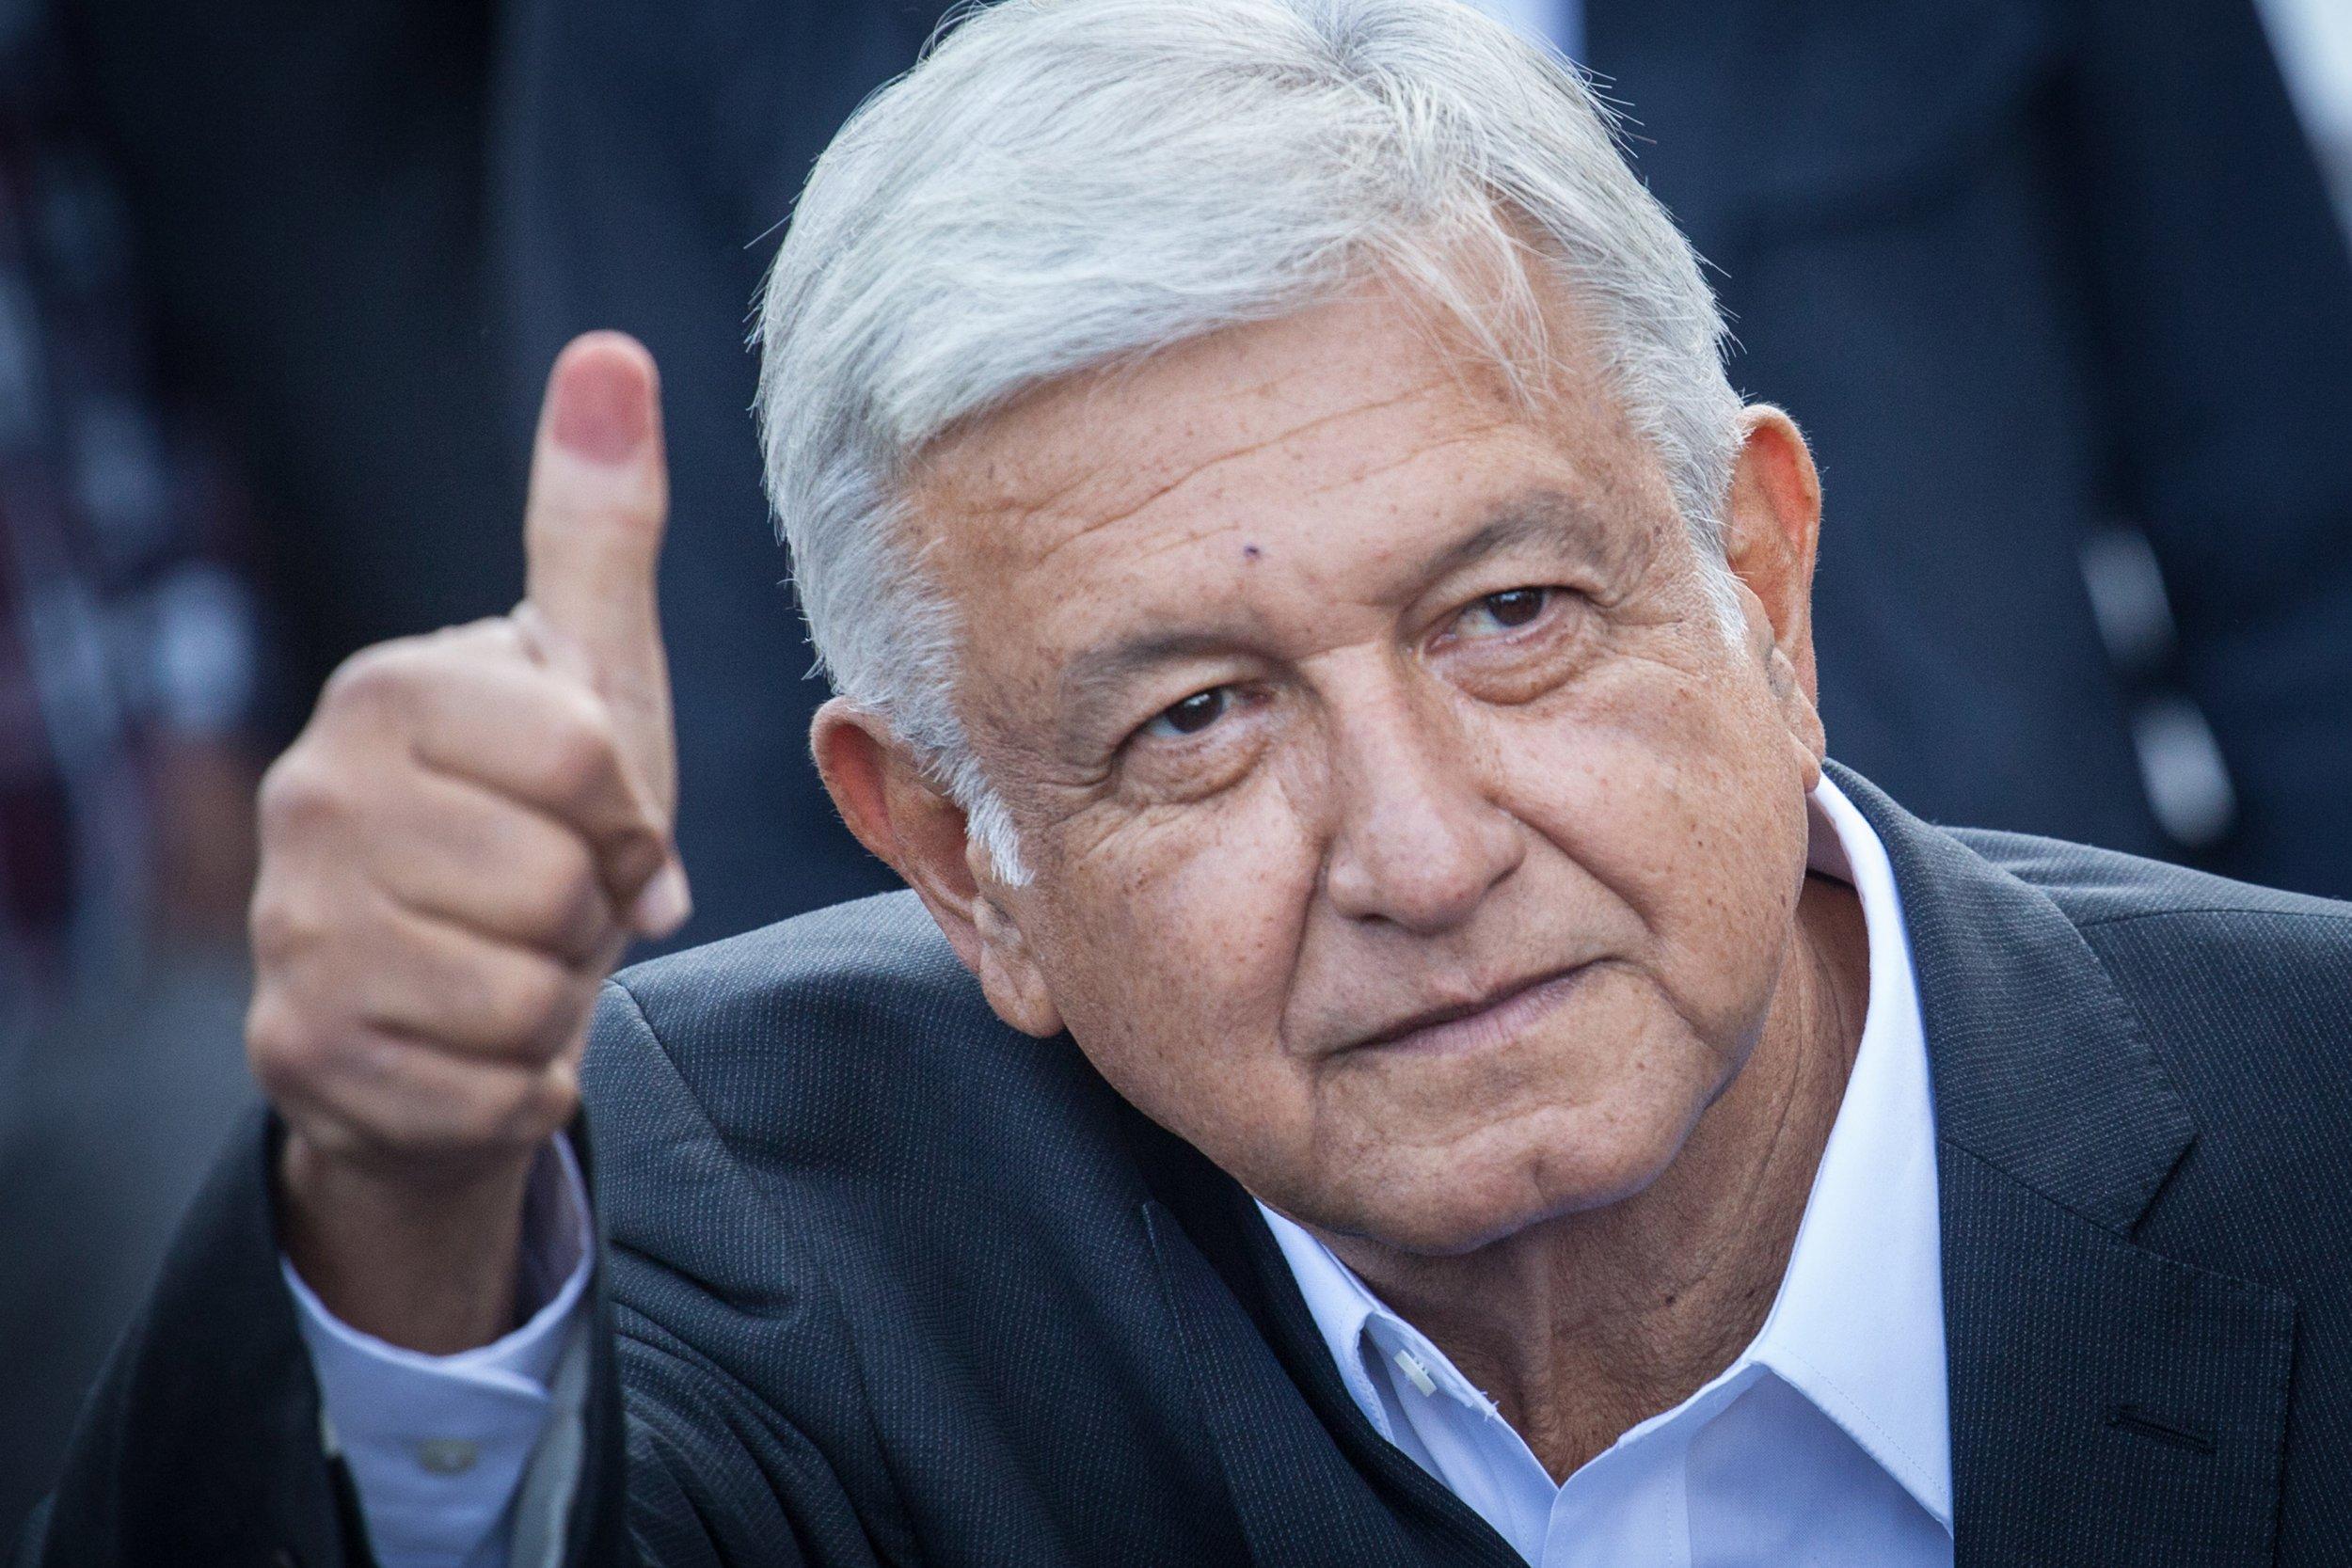 Mexico Presidential Election Results: Meet Anti-Trump Winner Andrés Manuel López Obrador